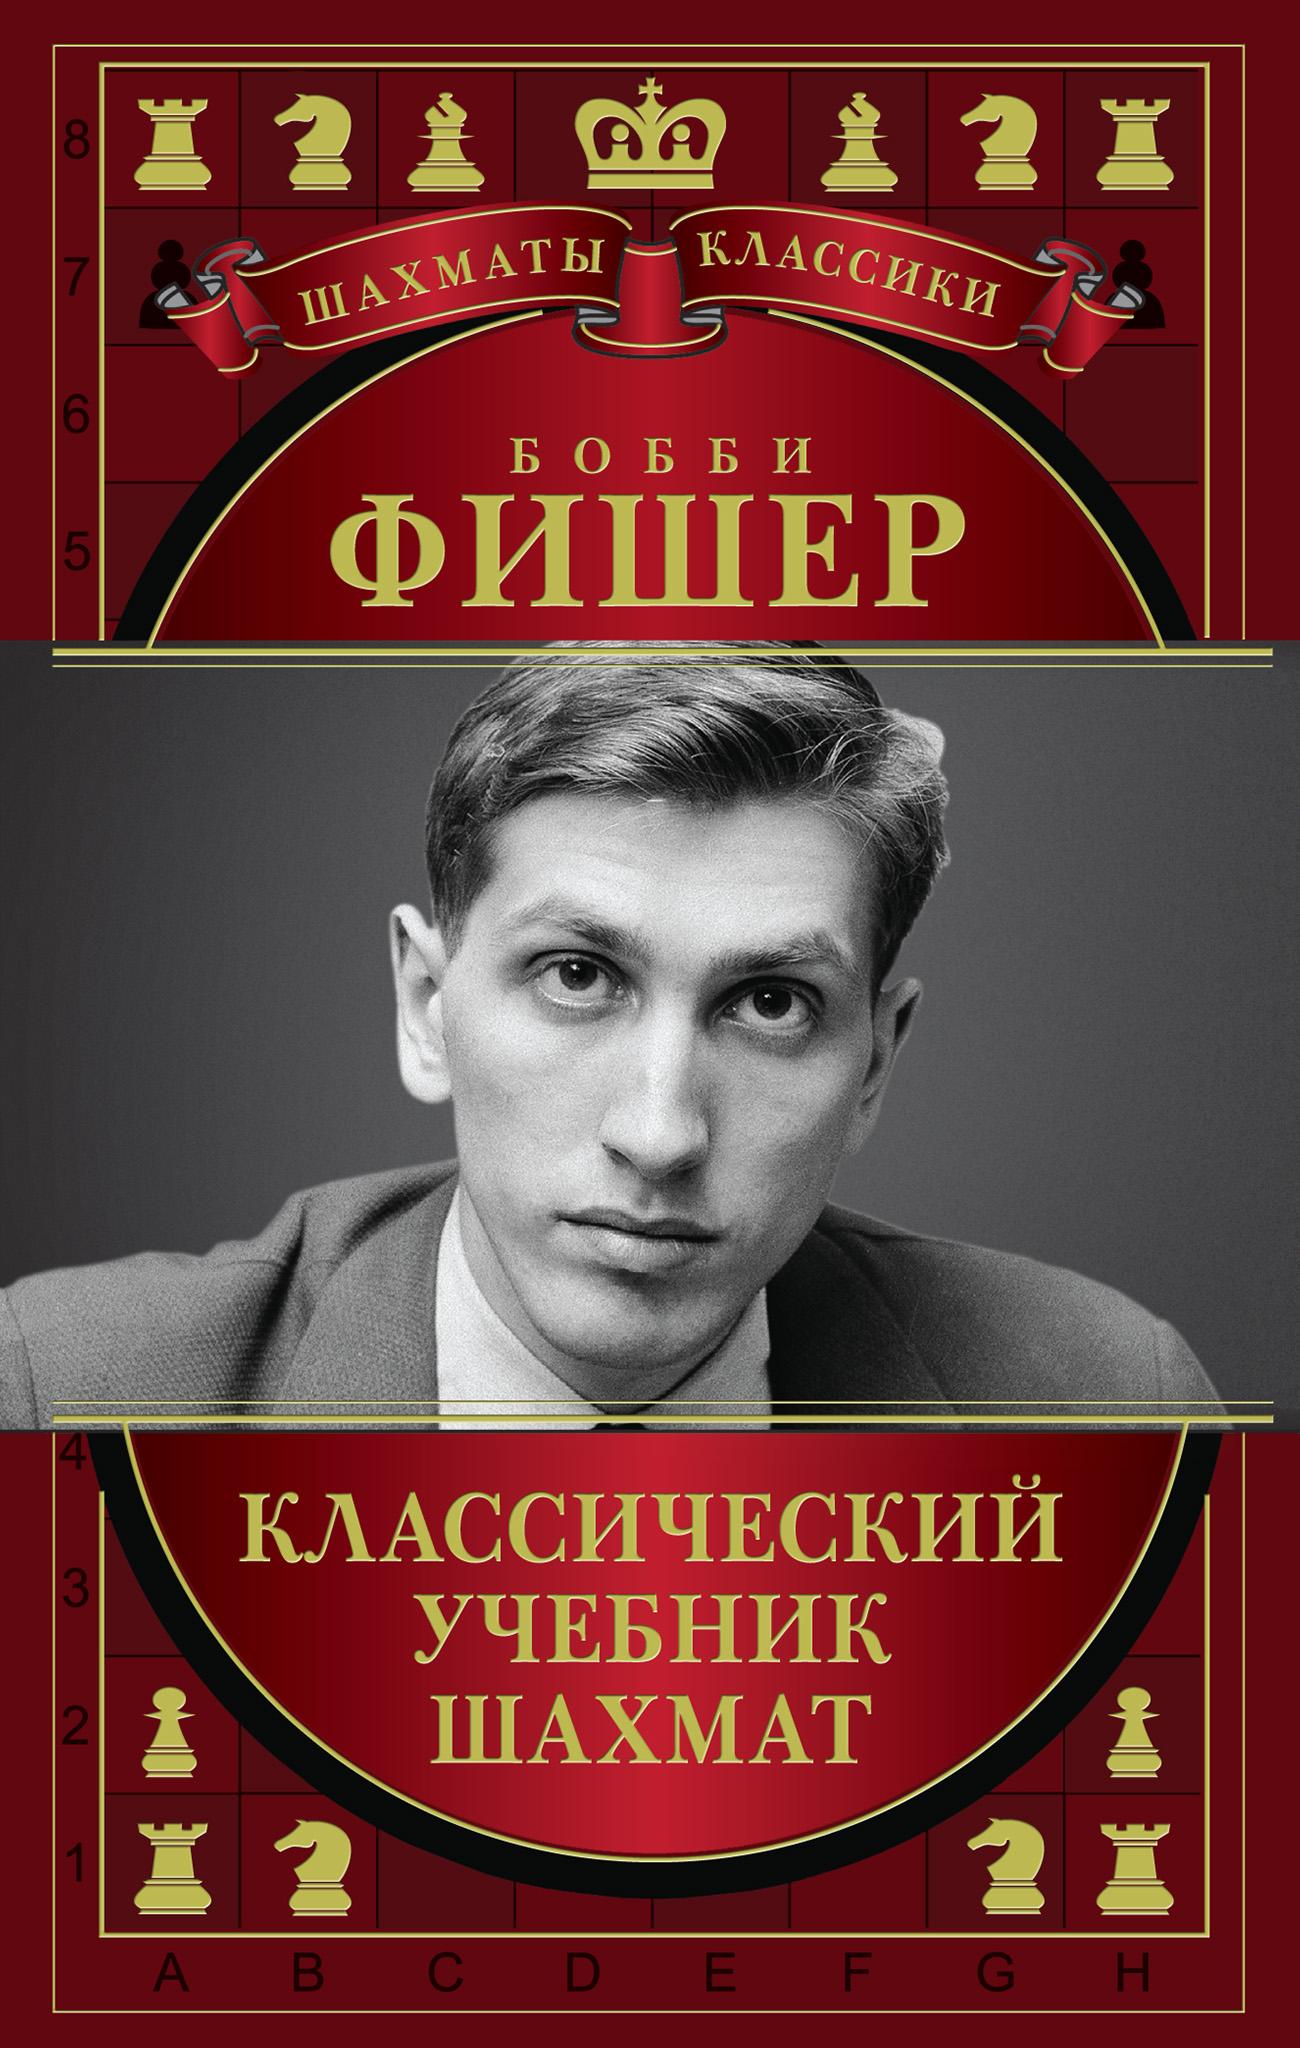 Николай Калиниченко Бобби Фишер. Классический учебник шахмат